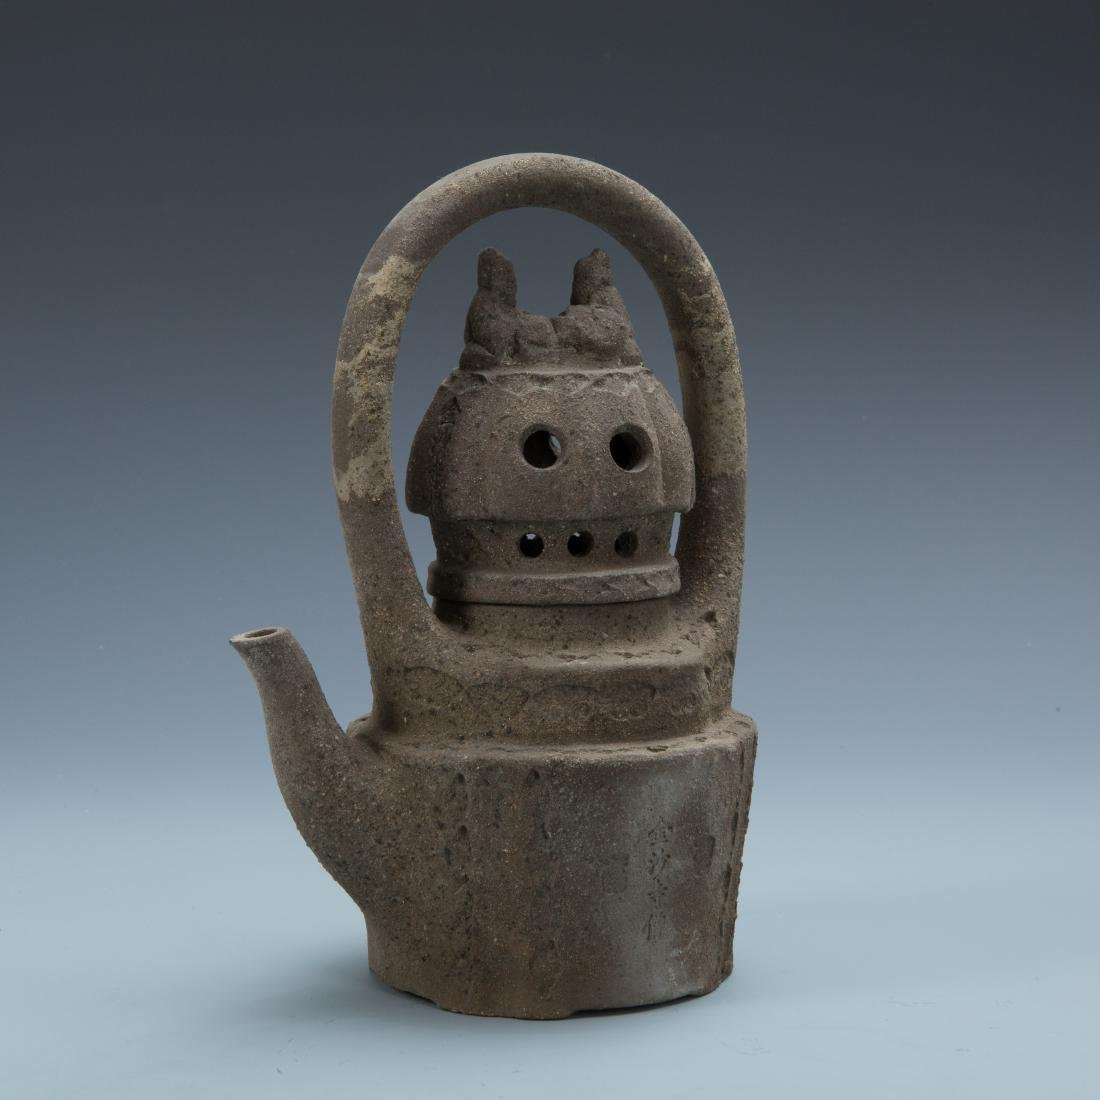 Estate Sale: Opium Pipe Carved Wood Statue Tea Pot - 2